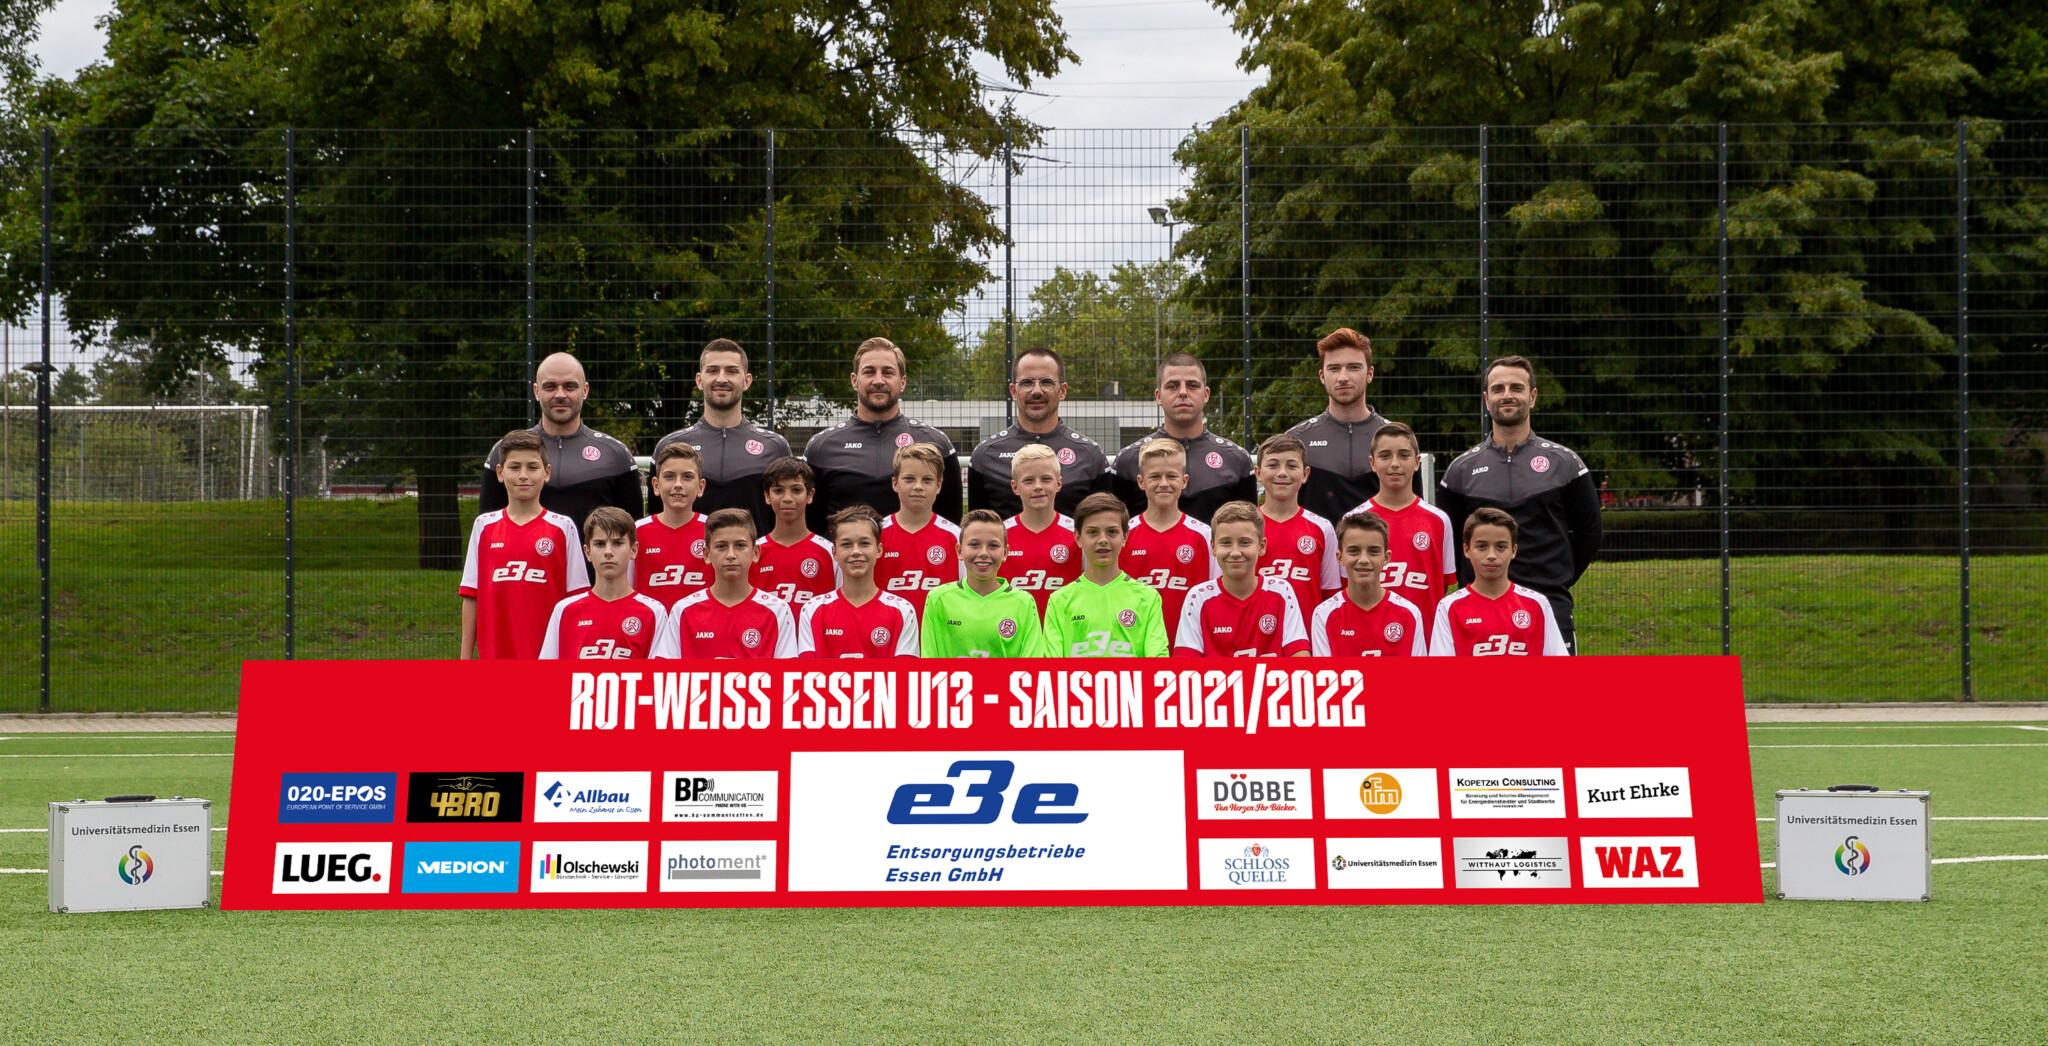 U13 – Rot-Weiss Essen